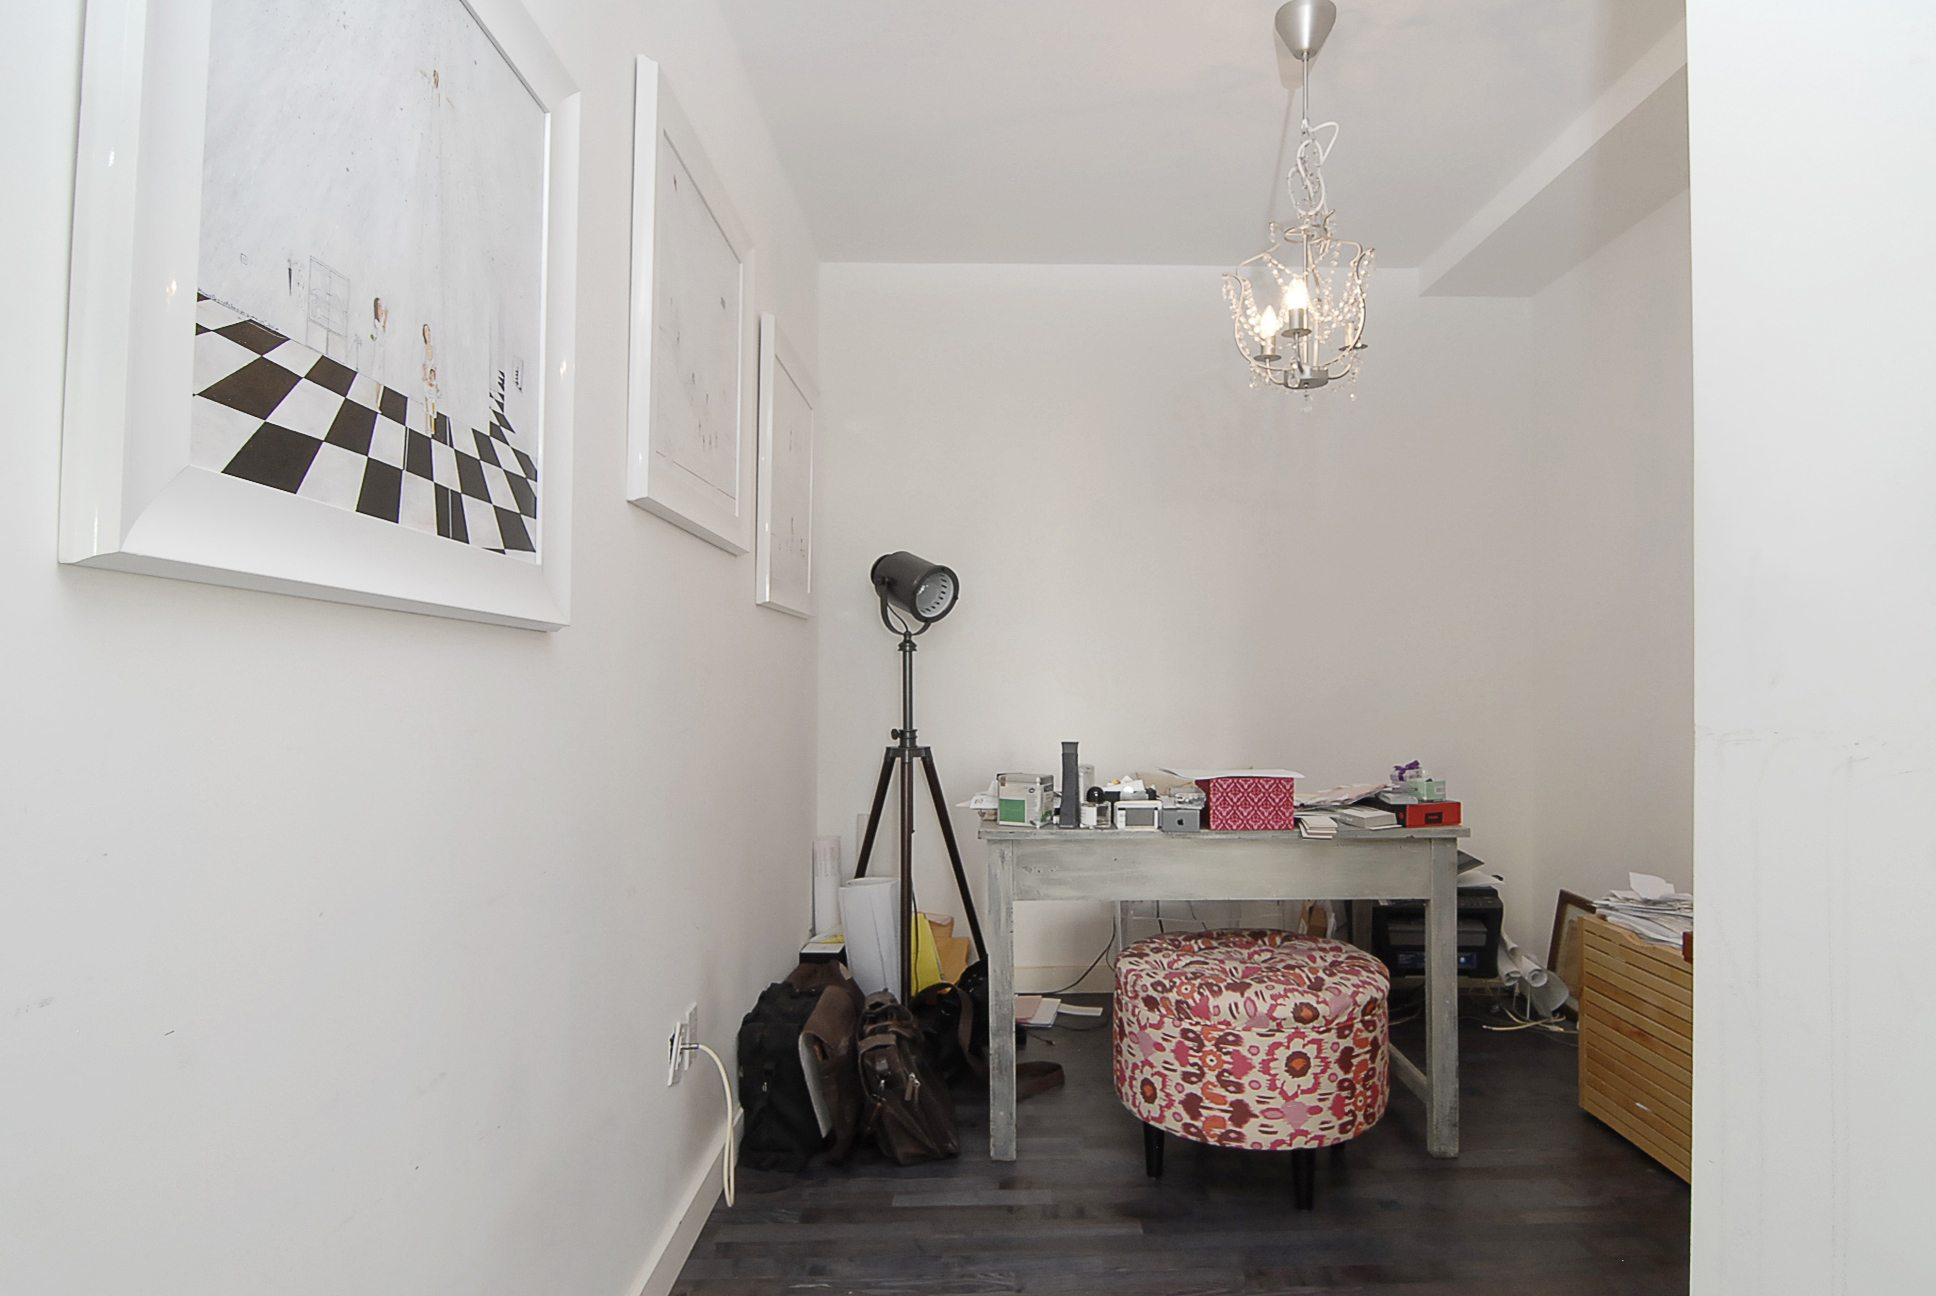 toronto-apartment-for-rent-701-dovercourt-road-3